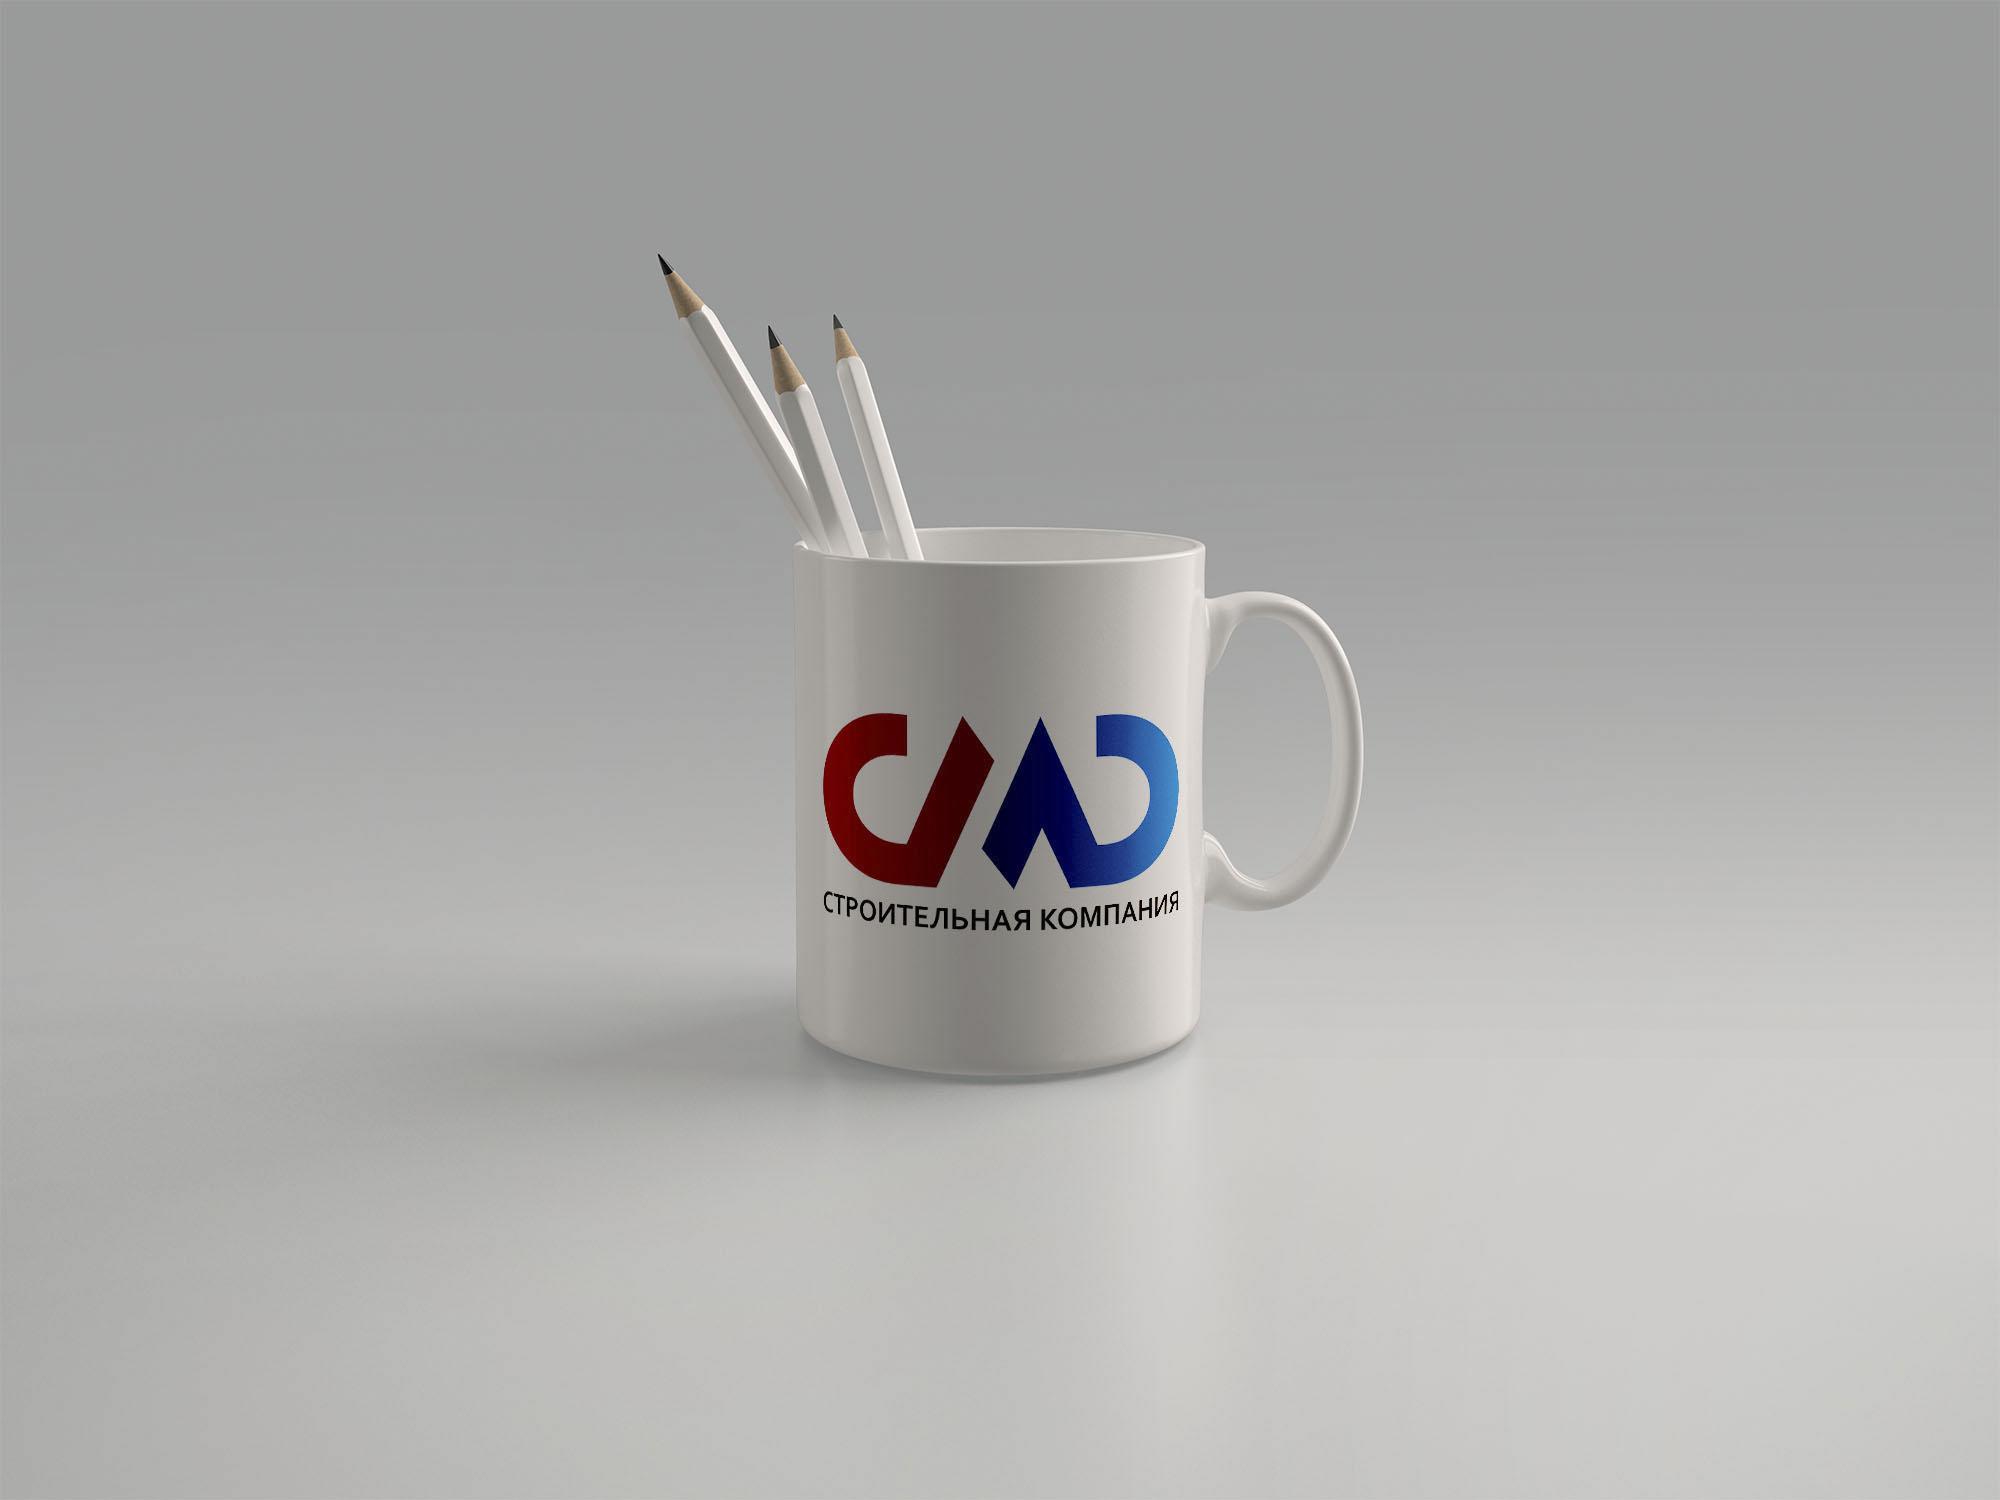 Дизайнер для разработки Логотипа для организации !СРОЧНО! фото f_2585a264bfbdf33c.jpg